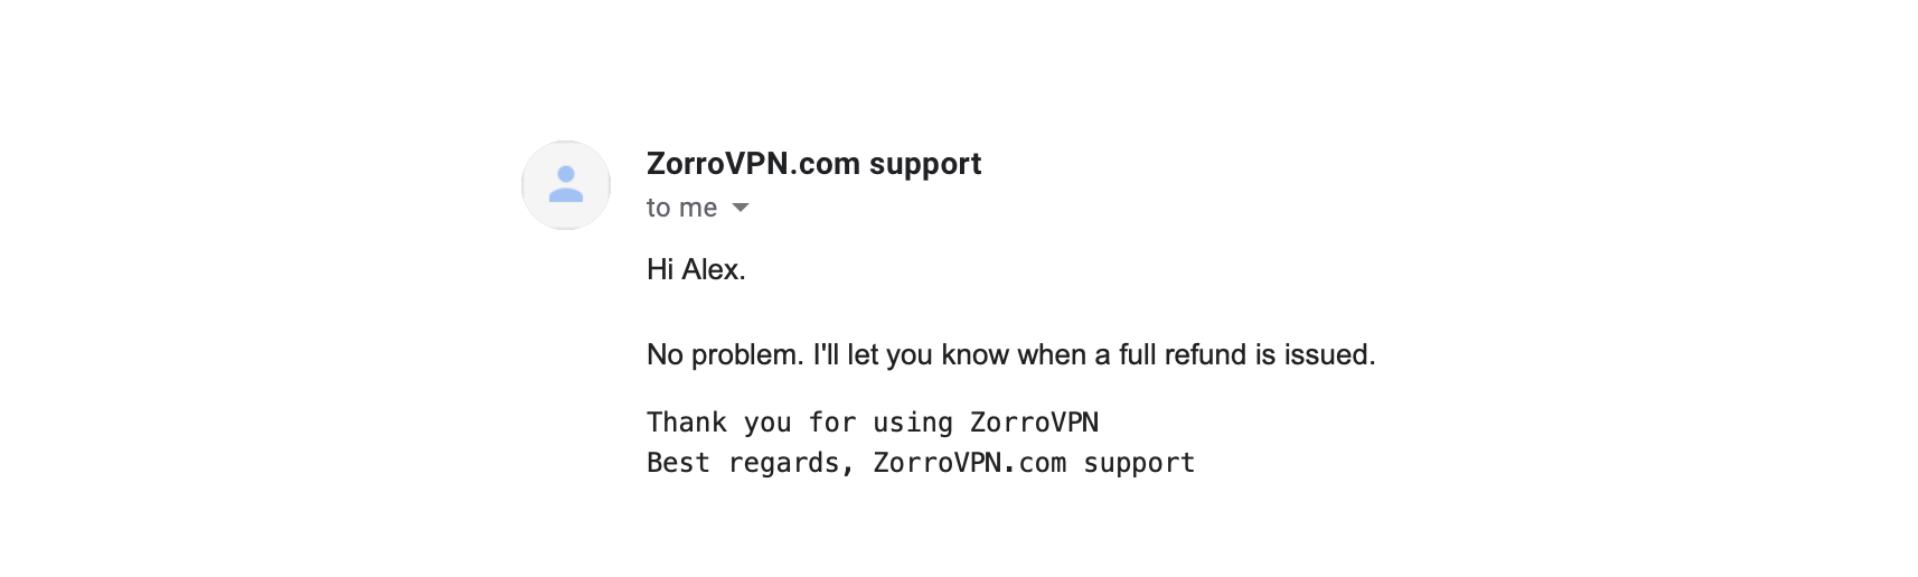 A screenshot of ZorroVPN's customer support.